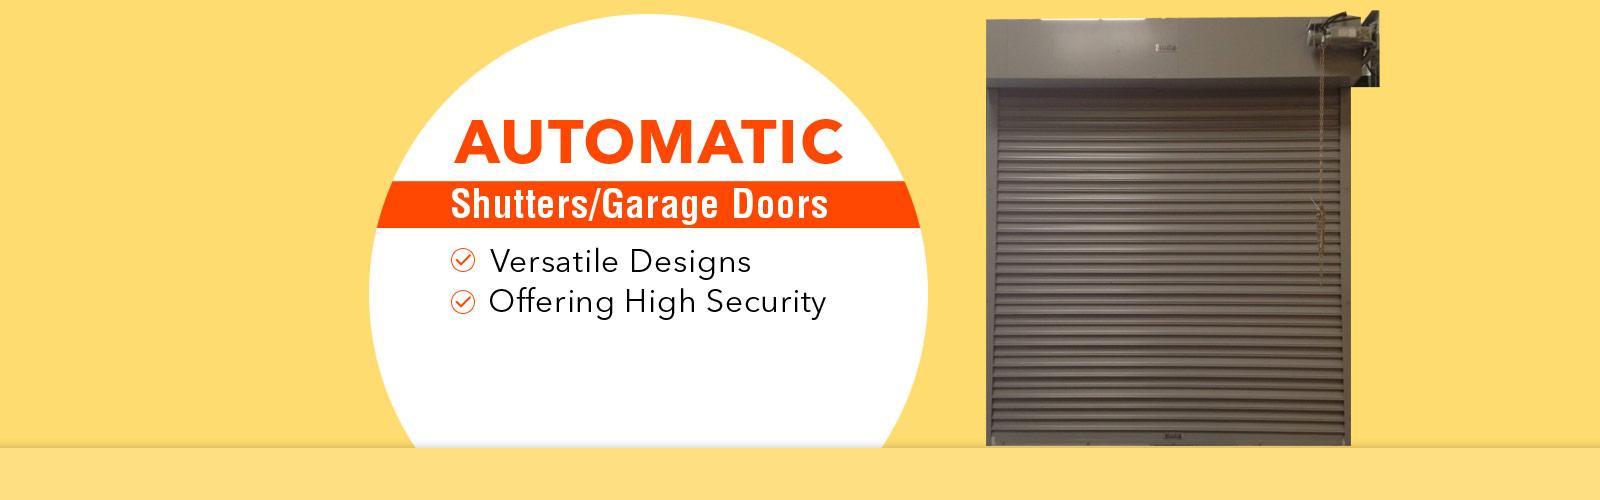 Automatic Shutter <span> Versatile Design